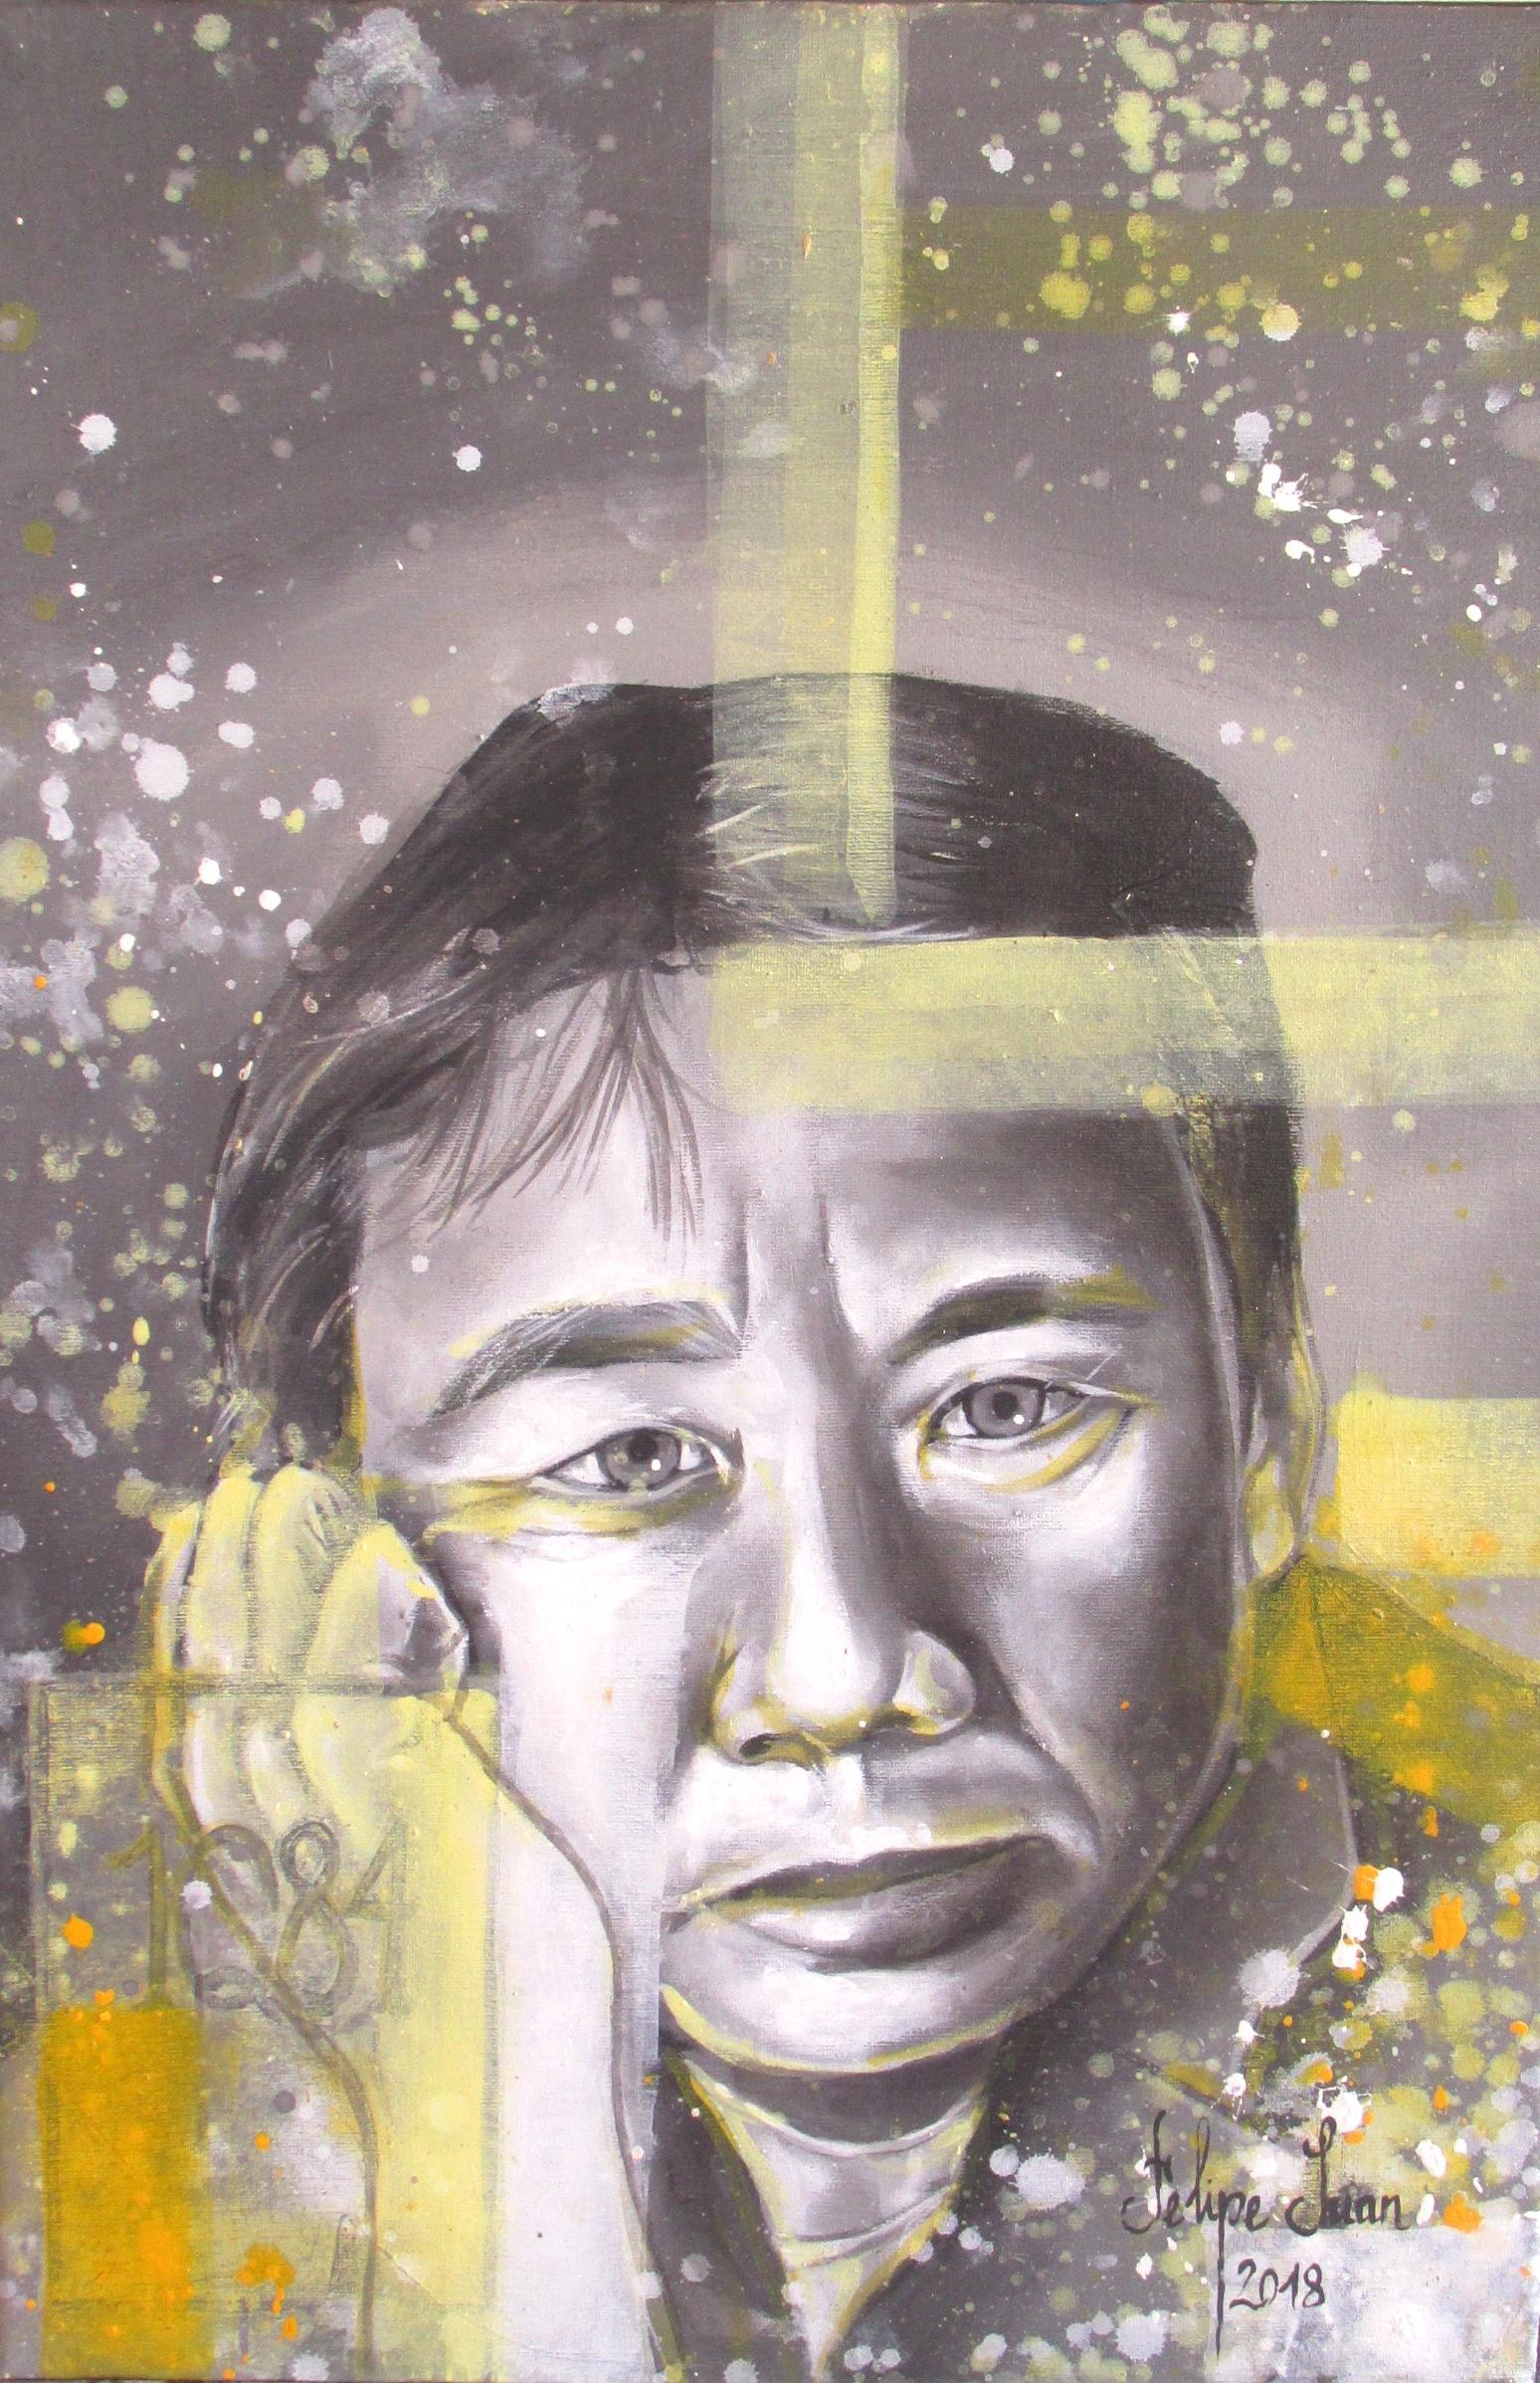 12.Haruki Murakami